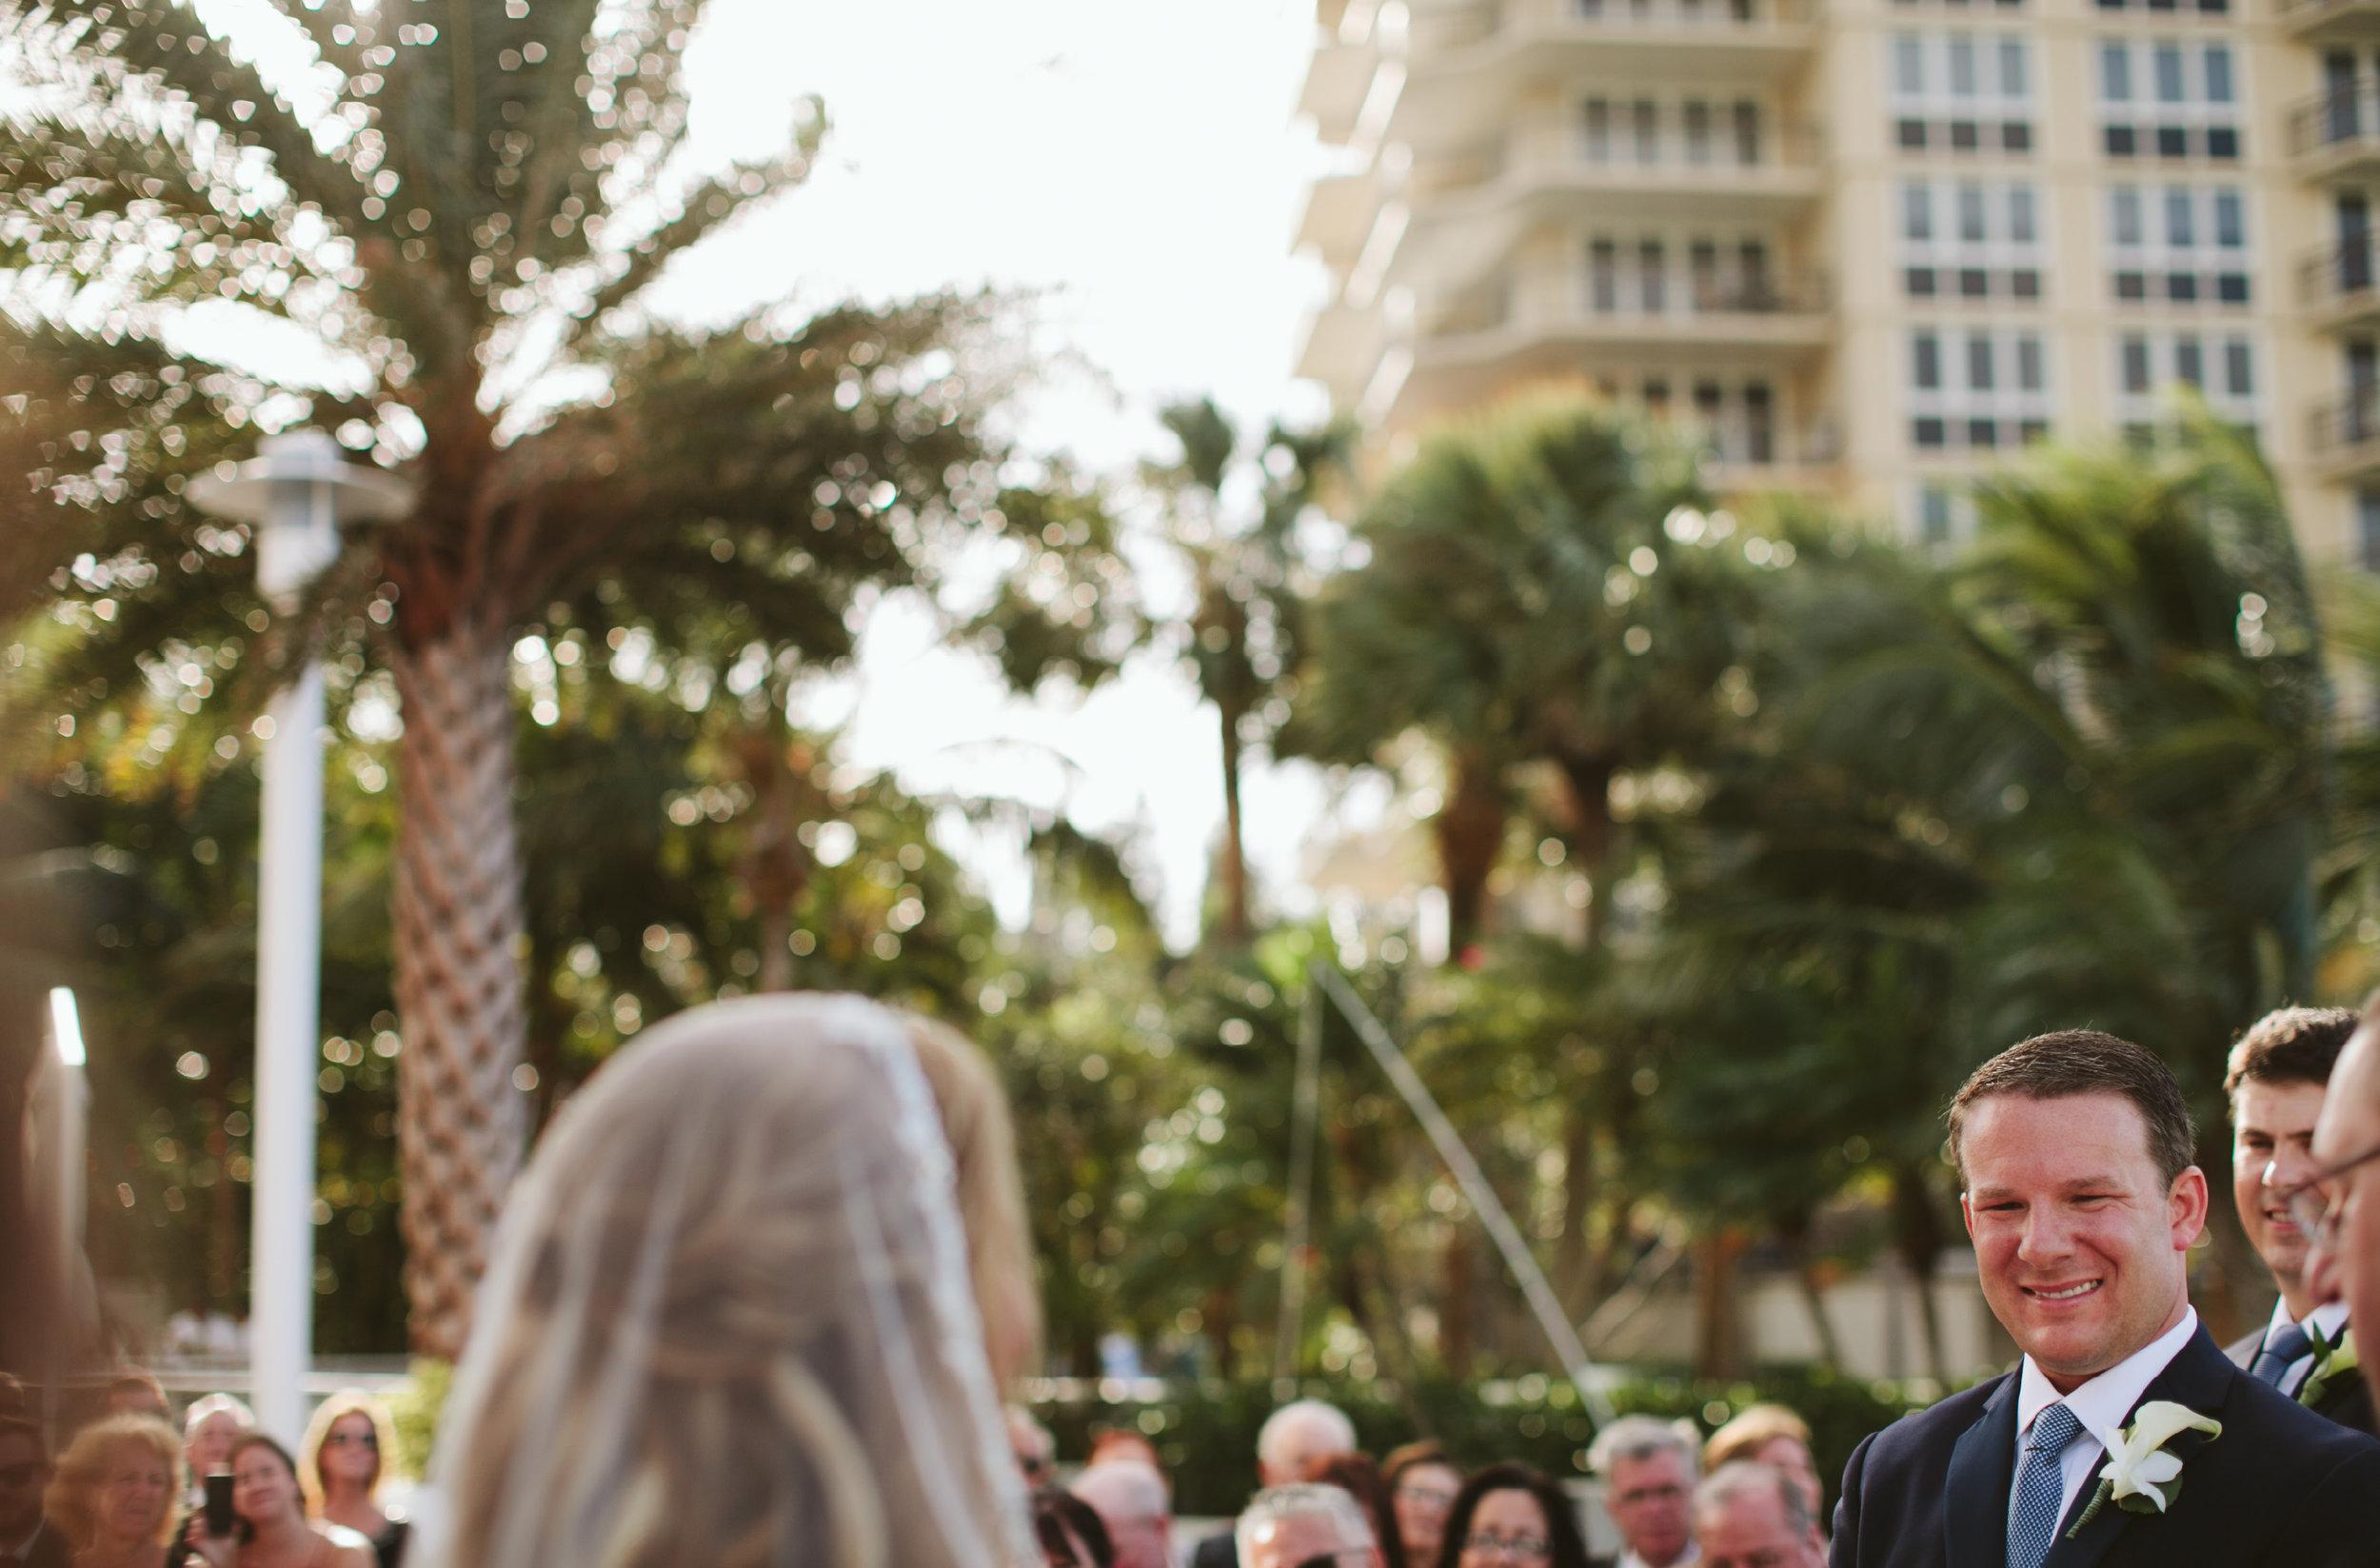 Kim + John's Wedding at the Waterstone Hotel in Boca Raton52.jpg